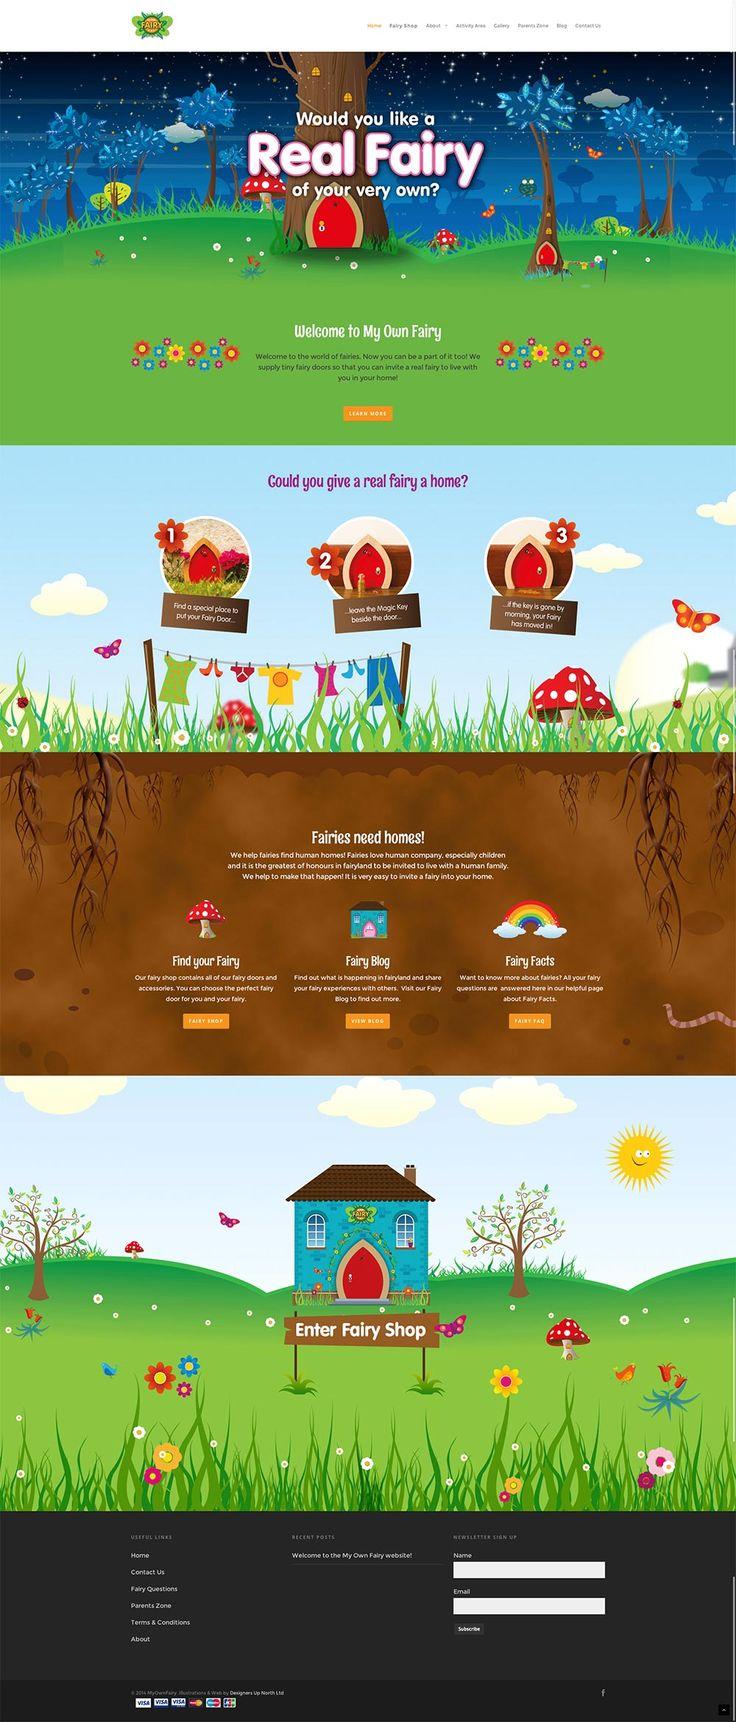 Unique Web Design, Real Fairy #WebDesign #Design (http://www.pinterest.com/aldenchong/)